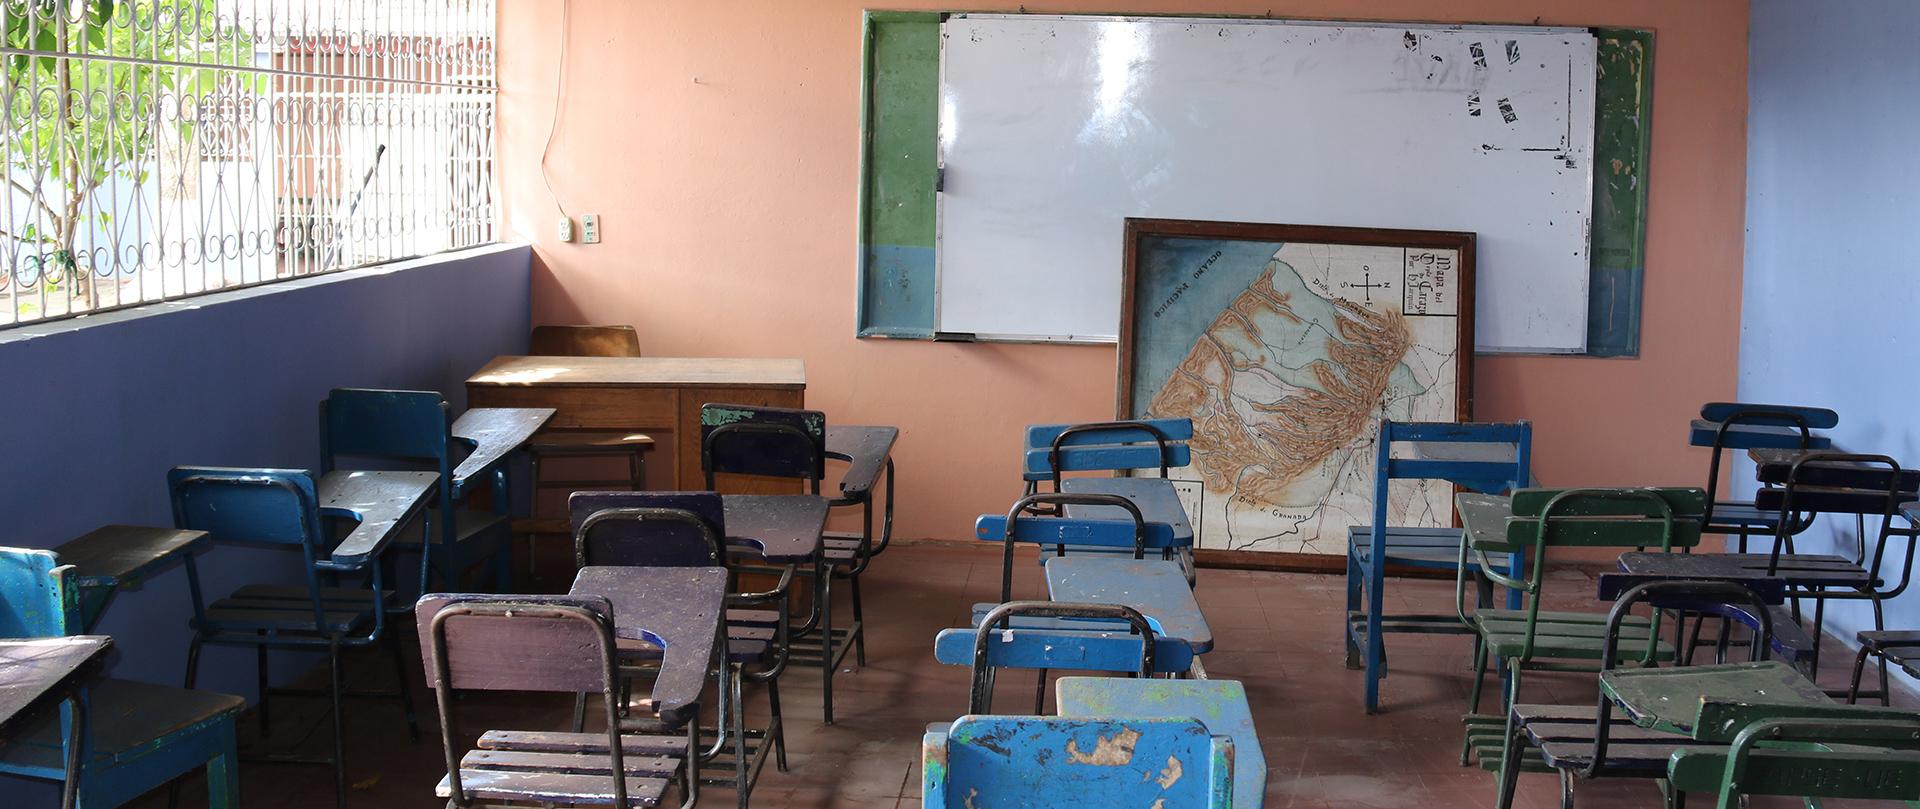 Blog_NicaraguaSchule3